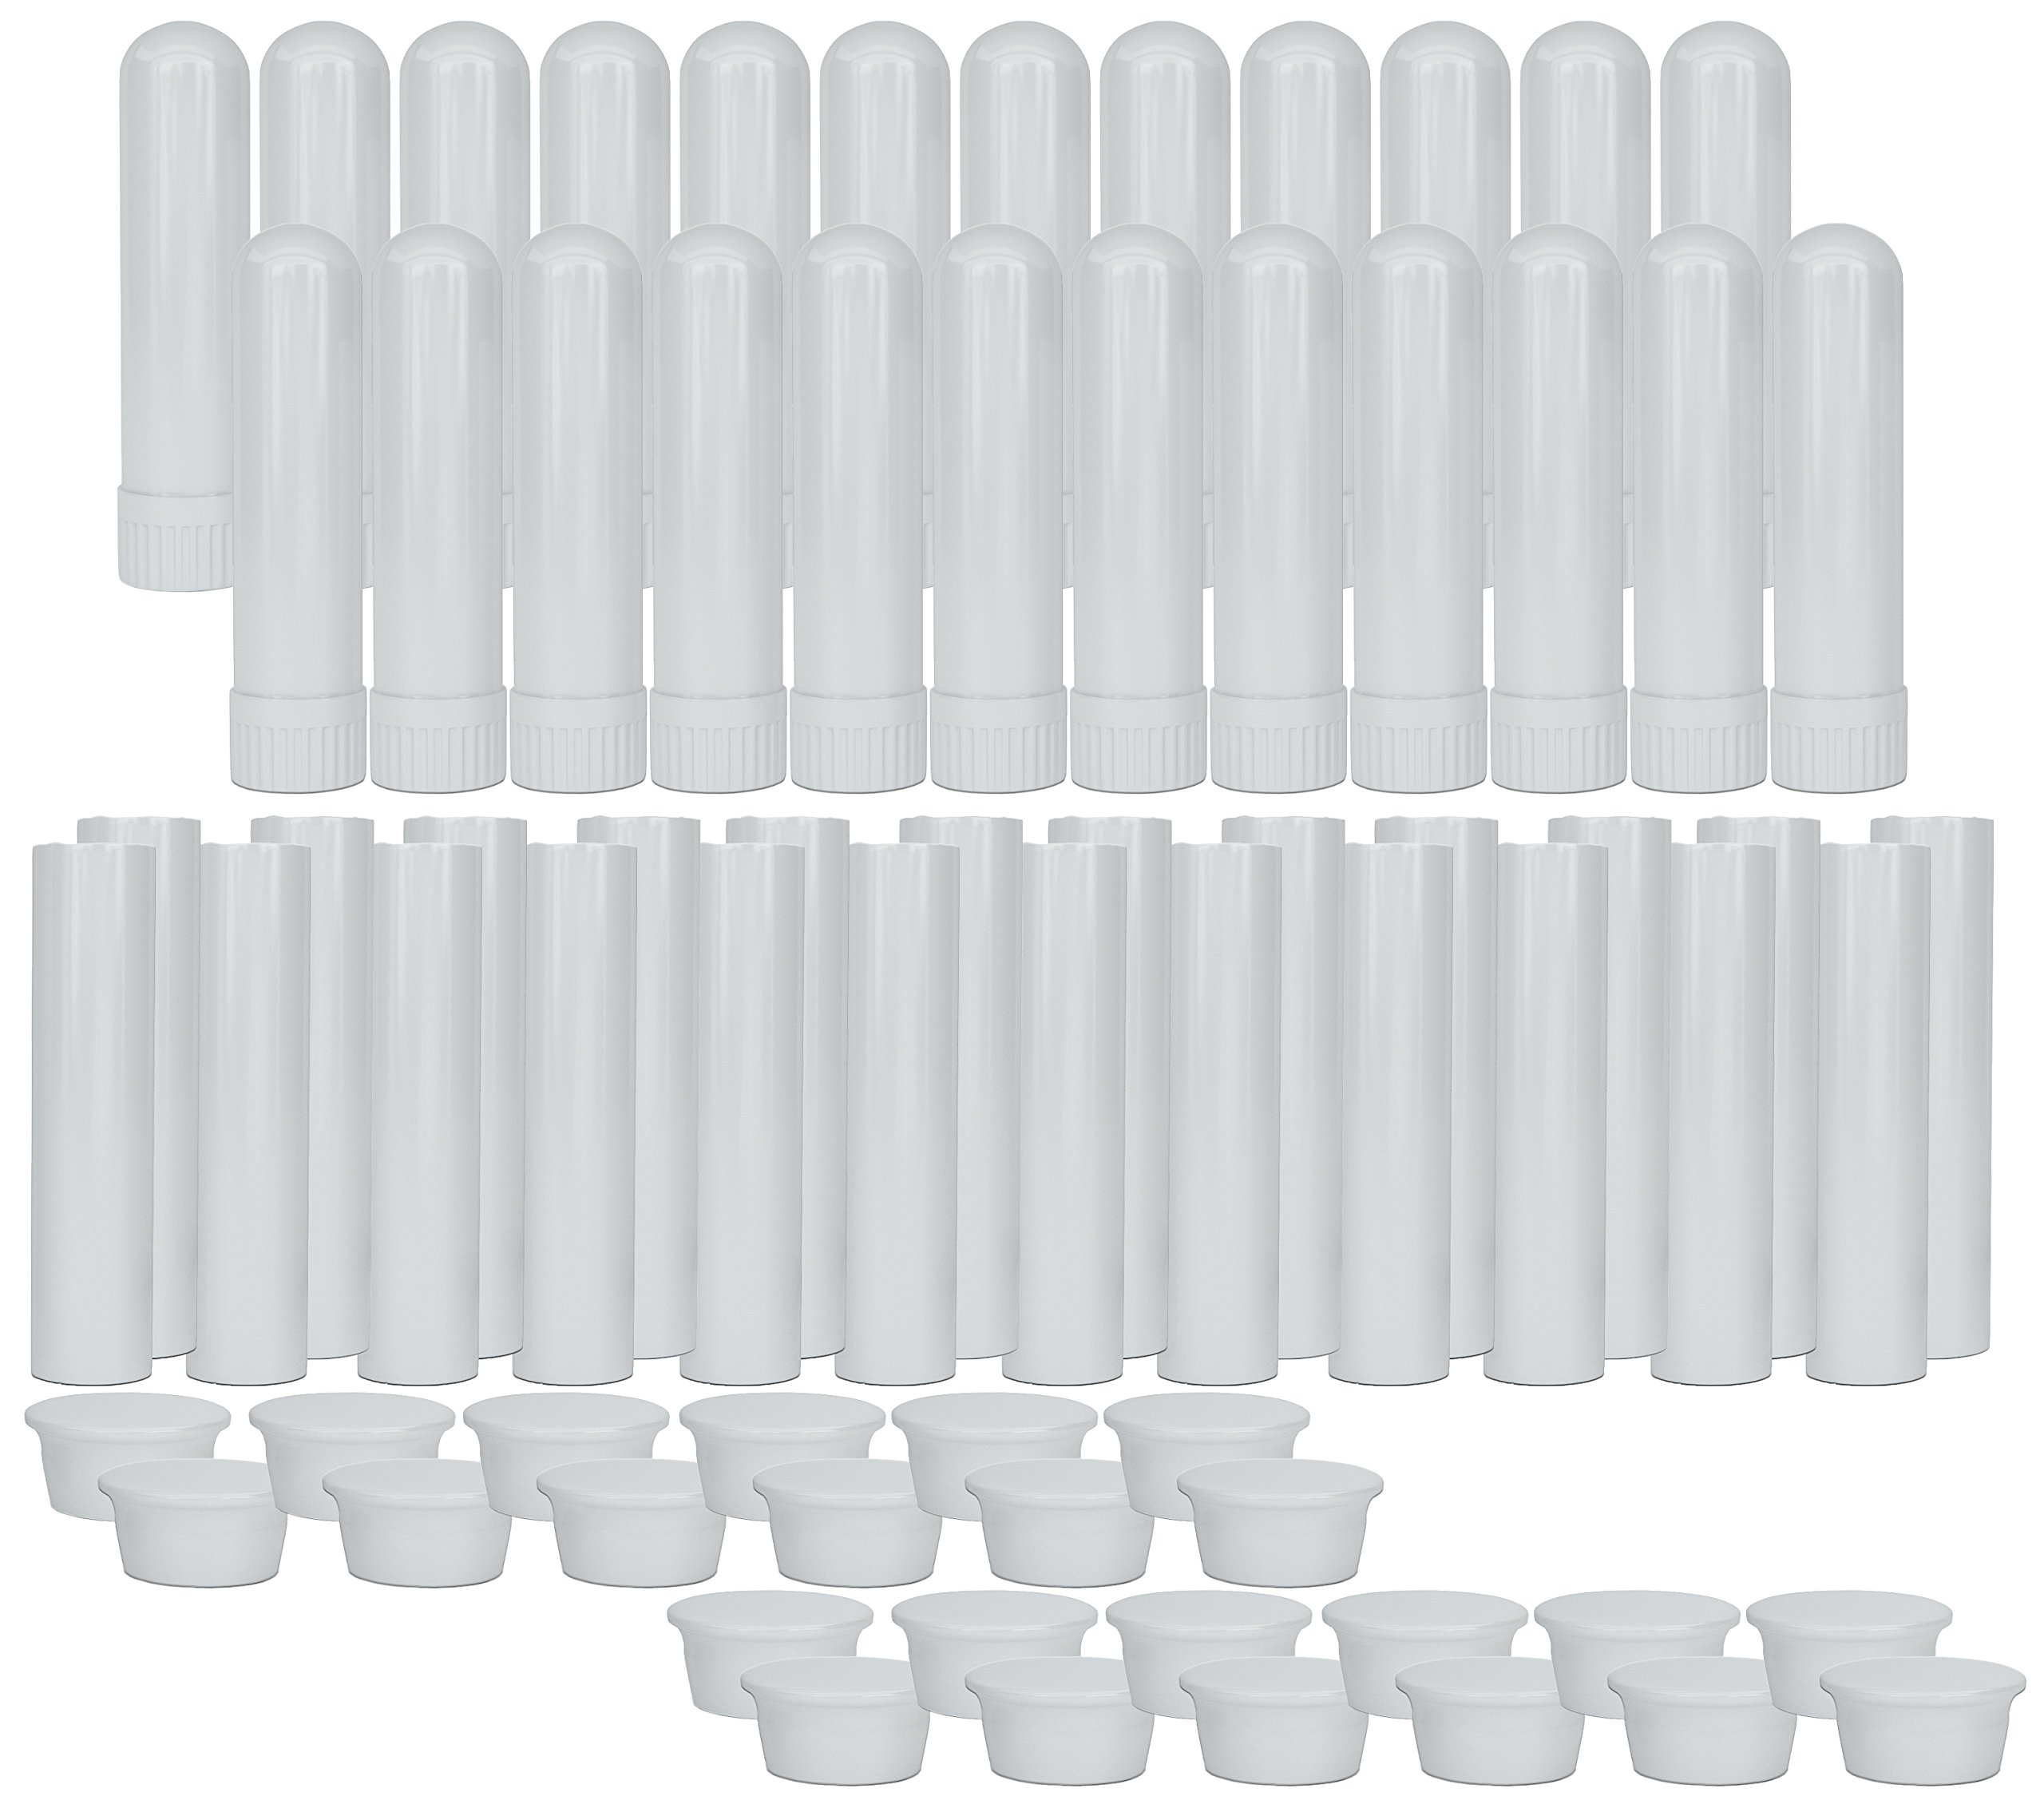 Essential Oil Aromatherapy White Nasal Inhaler Tubes (24 Complete Sticks), Empty Blank Nasal Inhalers for Essential Oils